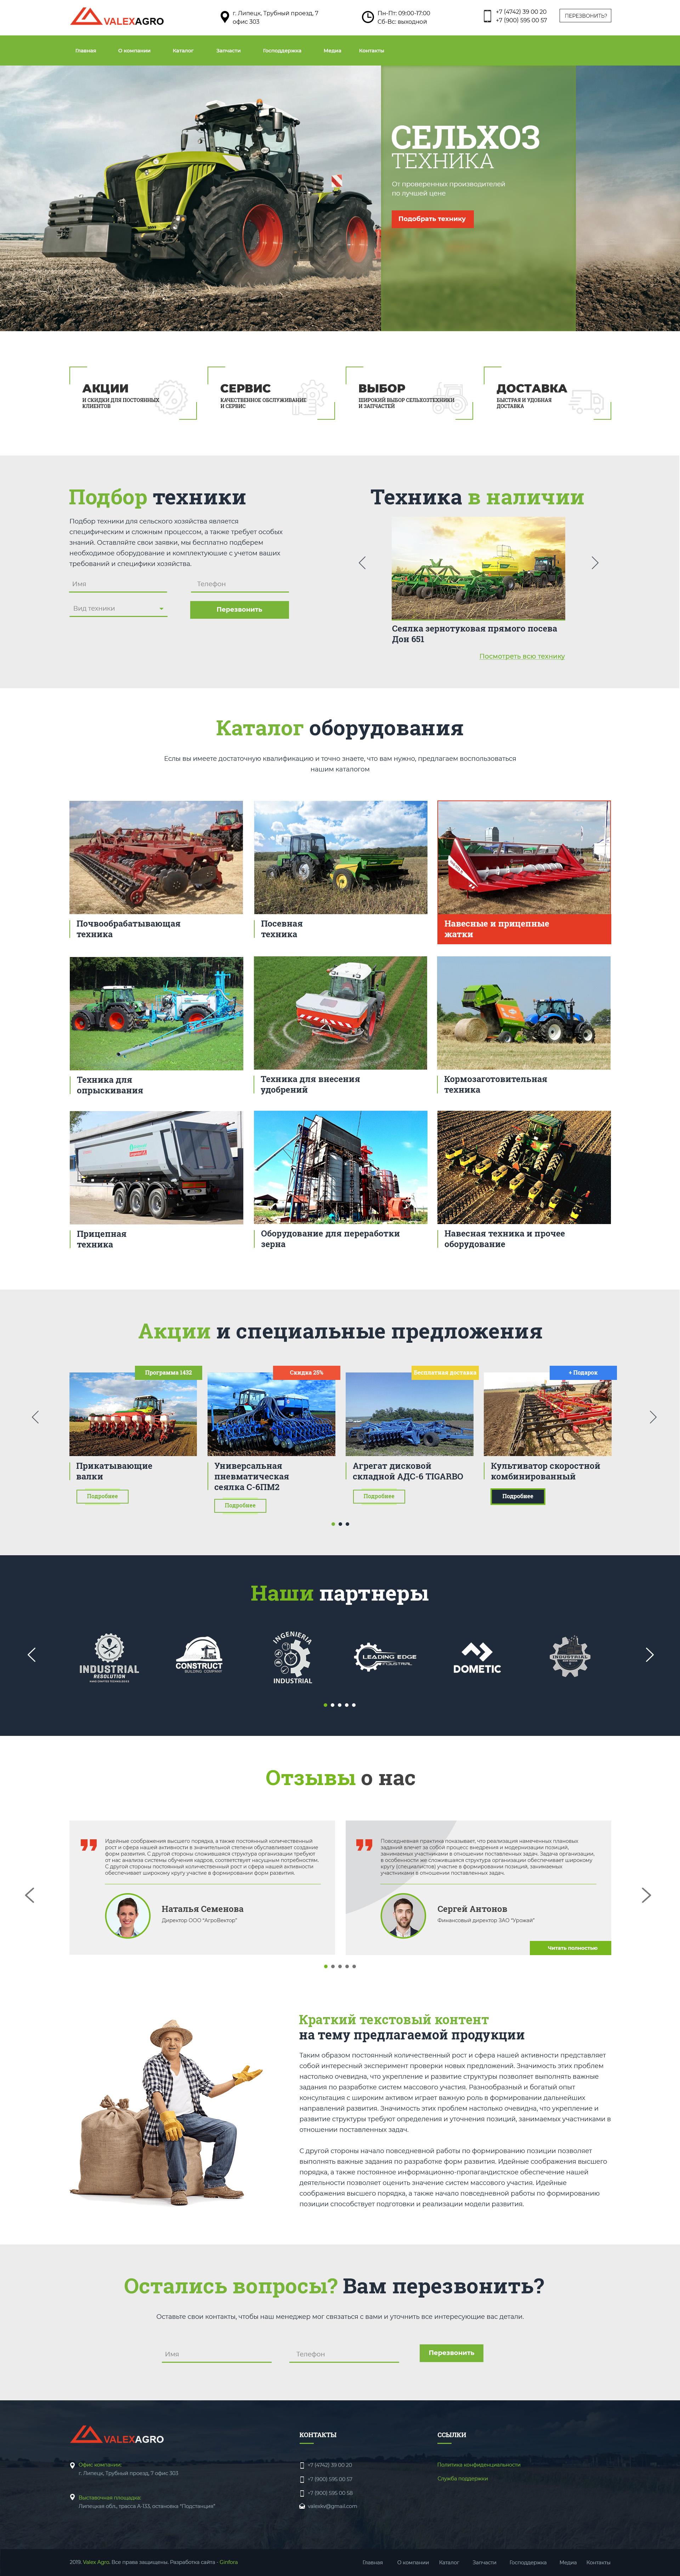 Site PSD template